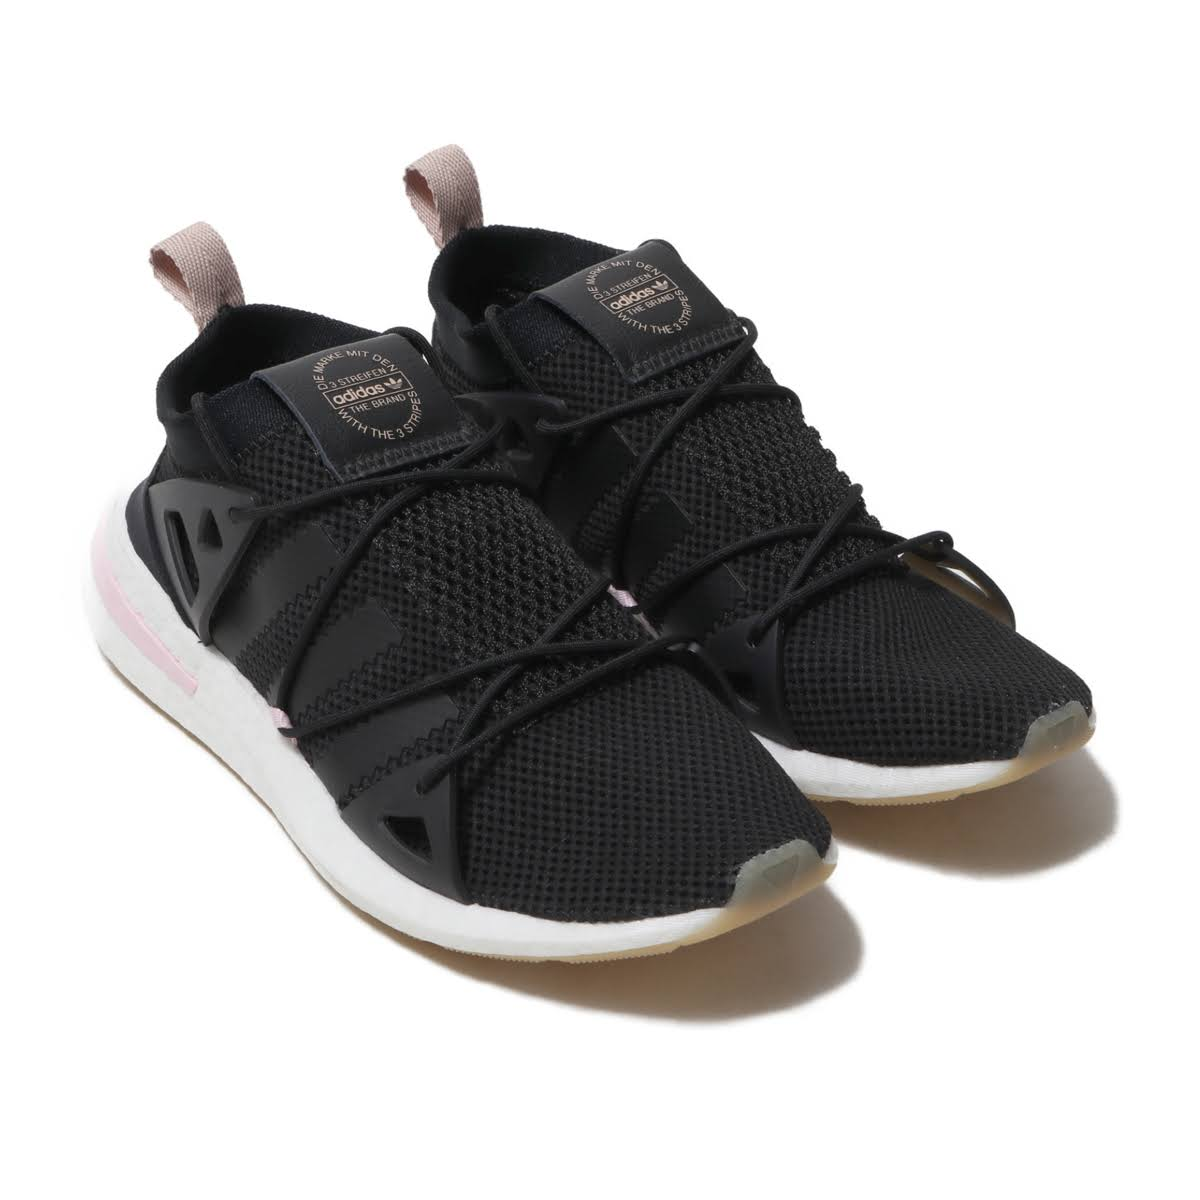 53de95c3bf74e6 adidas Originals ARKYN W (CORE BLACK CORE BLACK RUNNING WHITE) (Adidas  originals Arkin W)